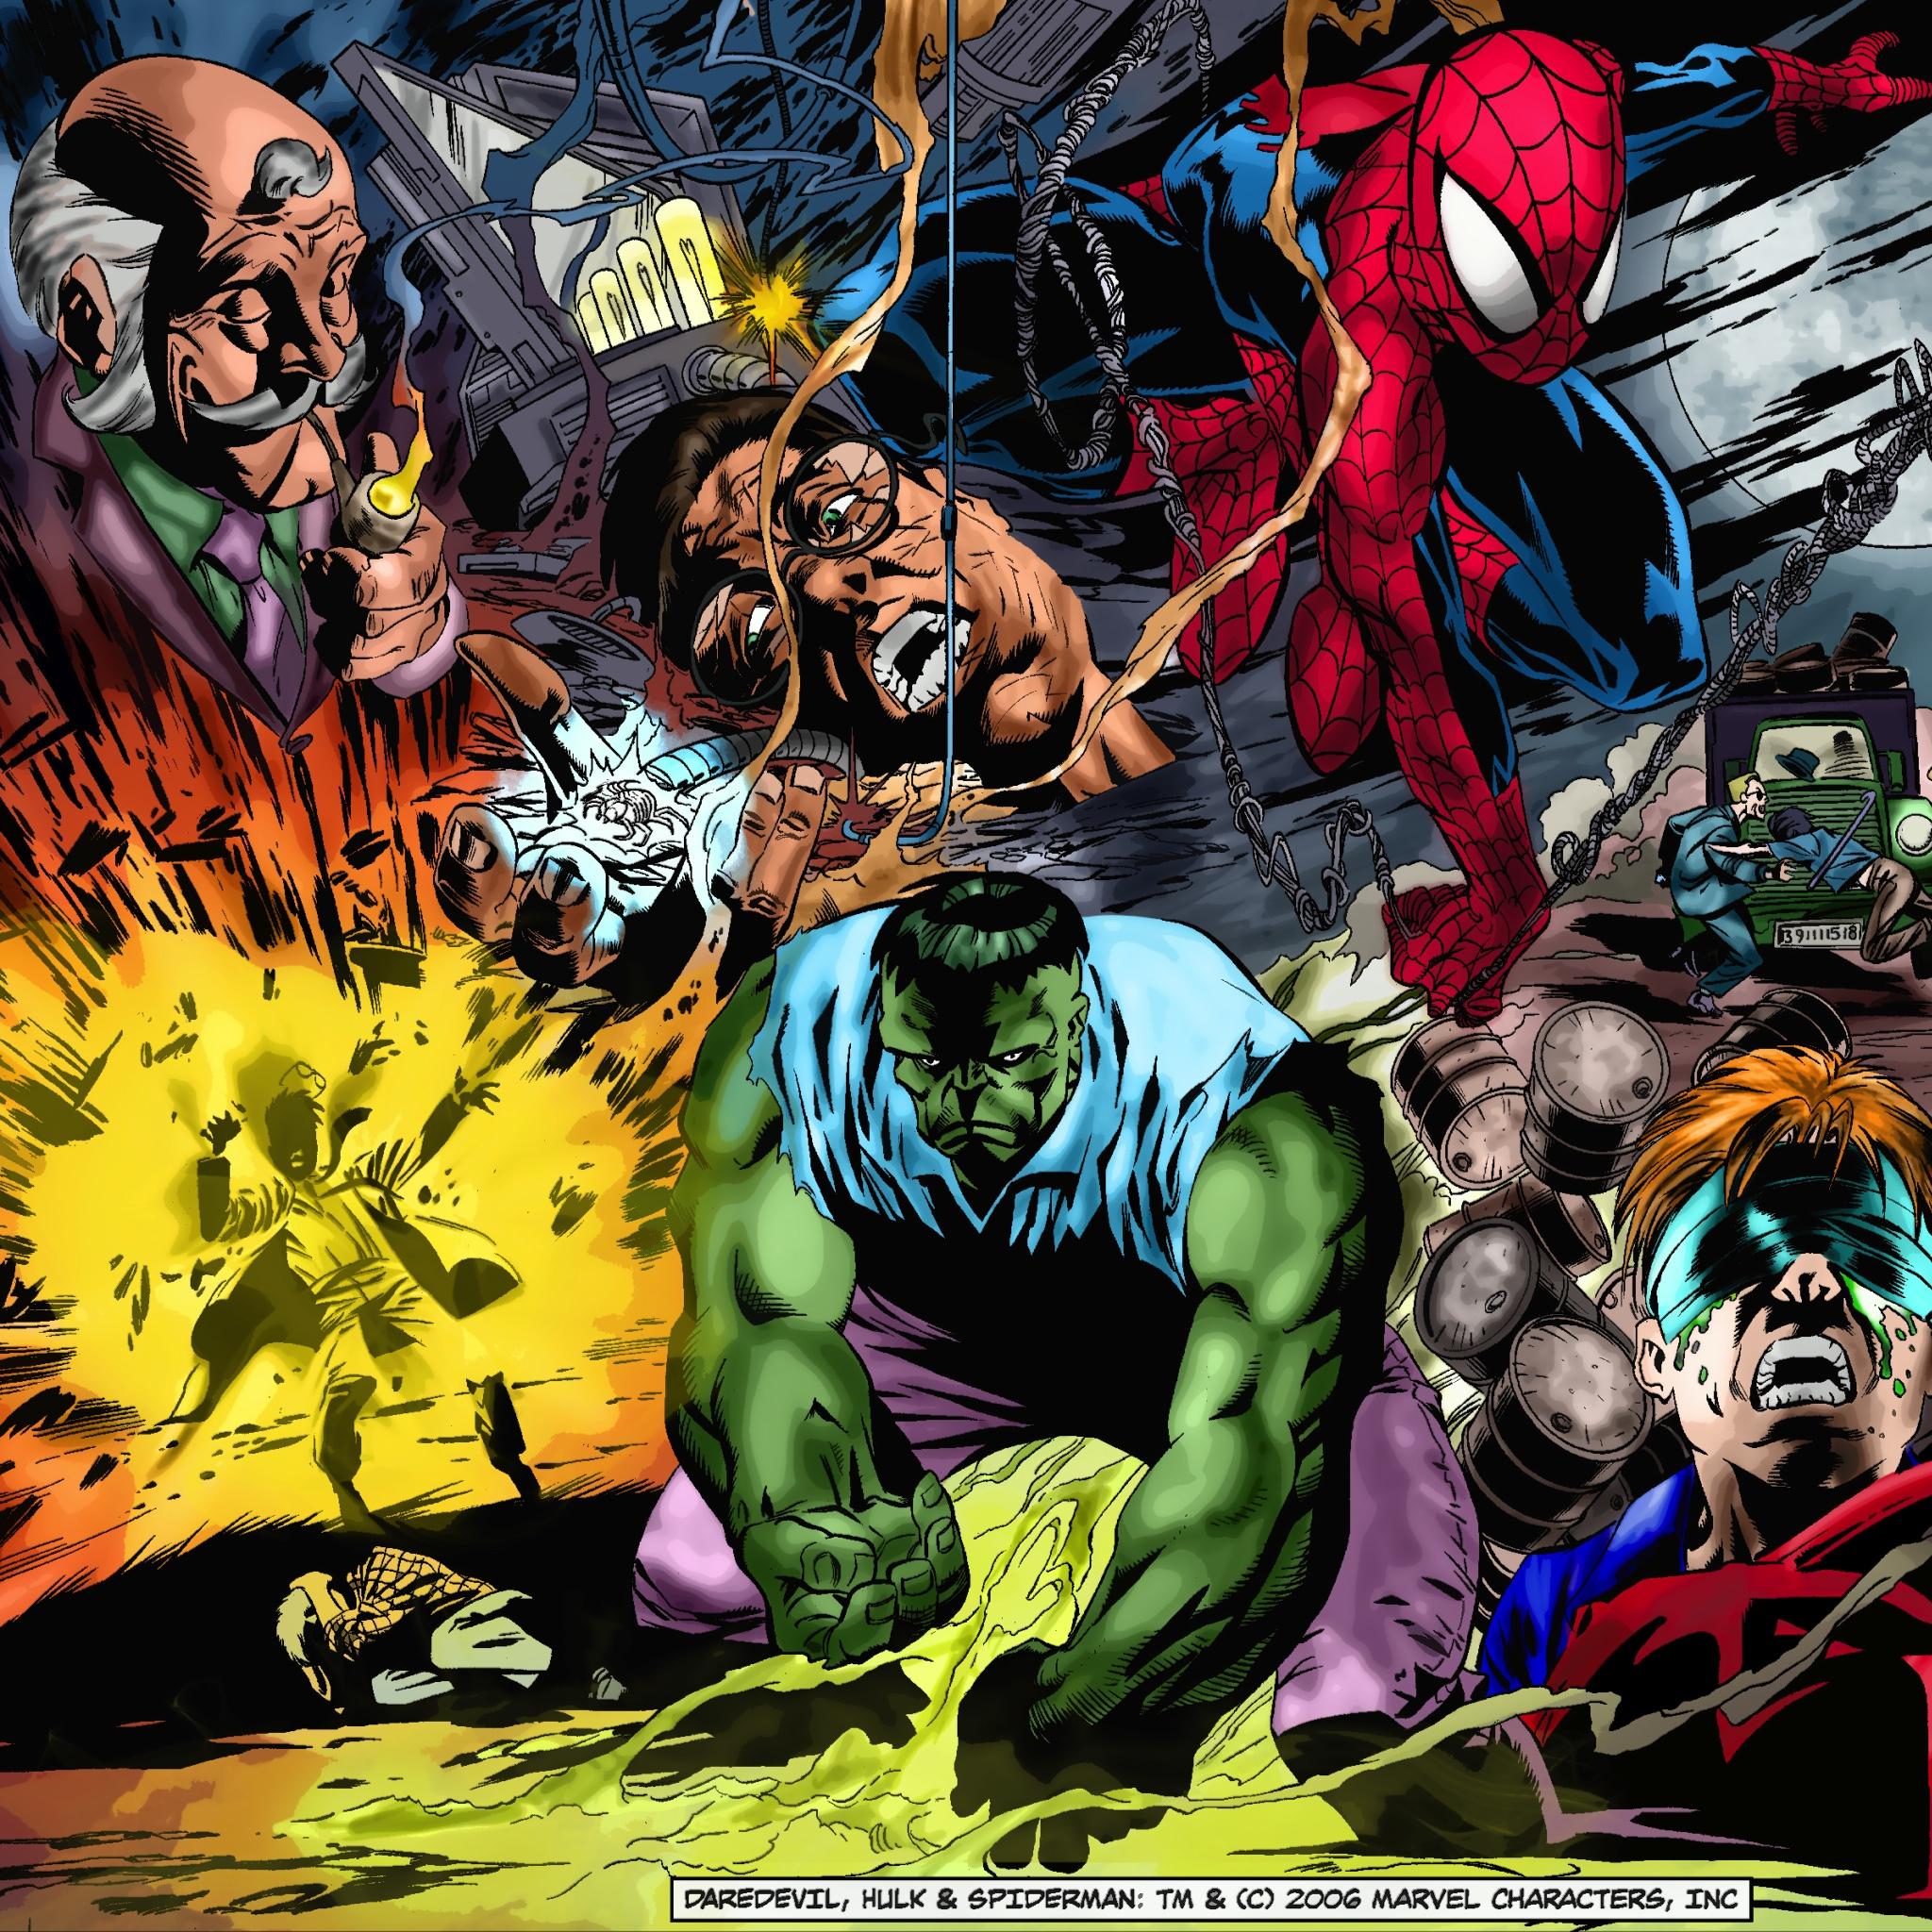 3WallpapersWallpaper HD iPhone X, 8, 7, 6 - The Superhero ...